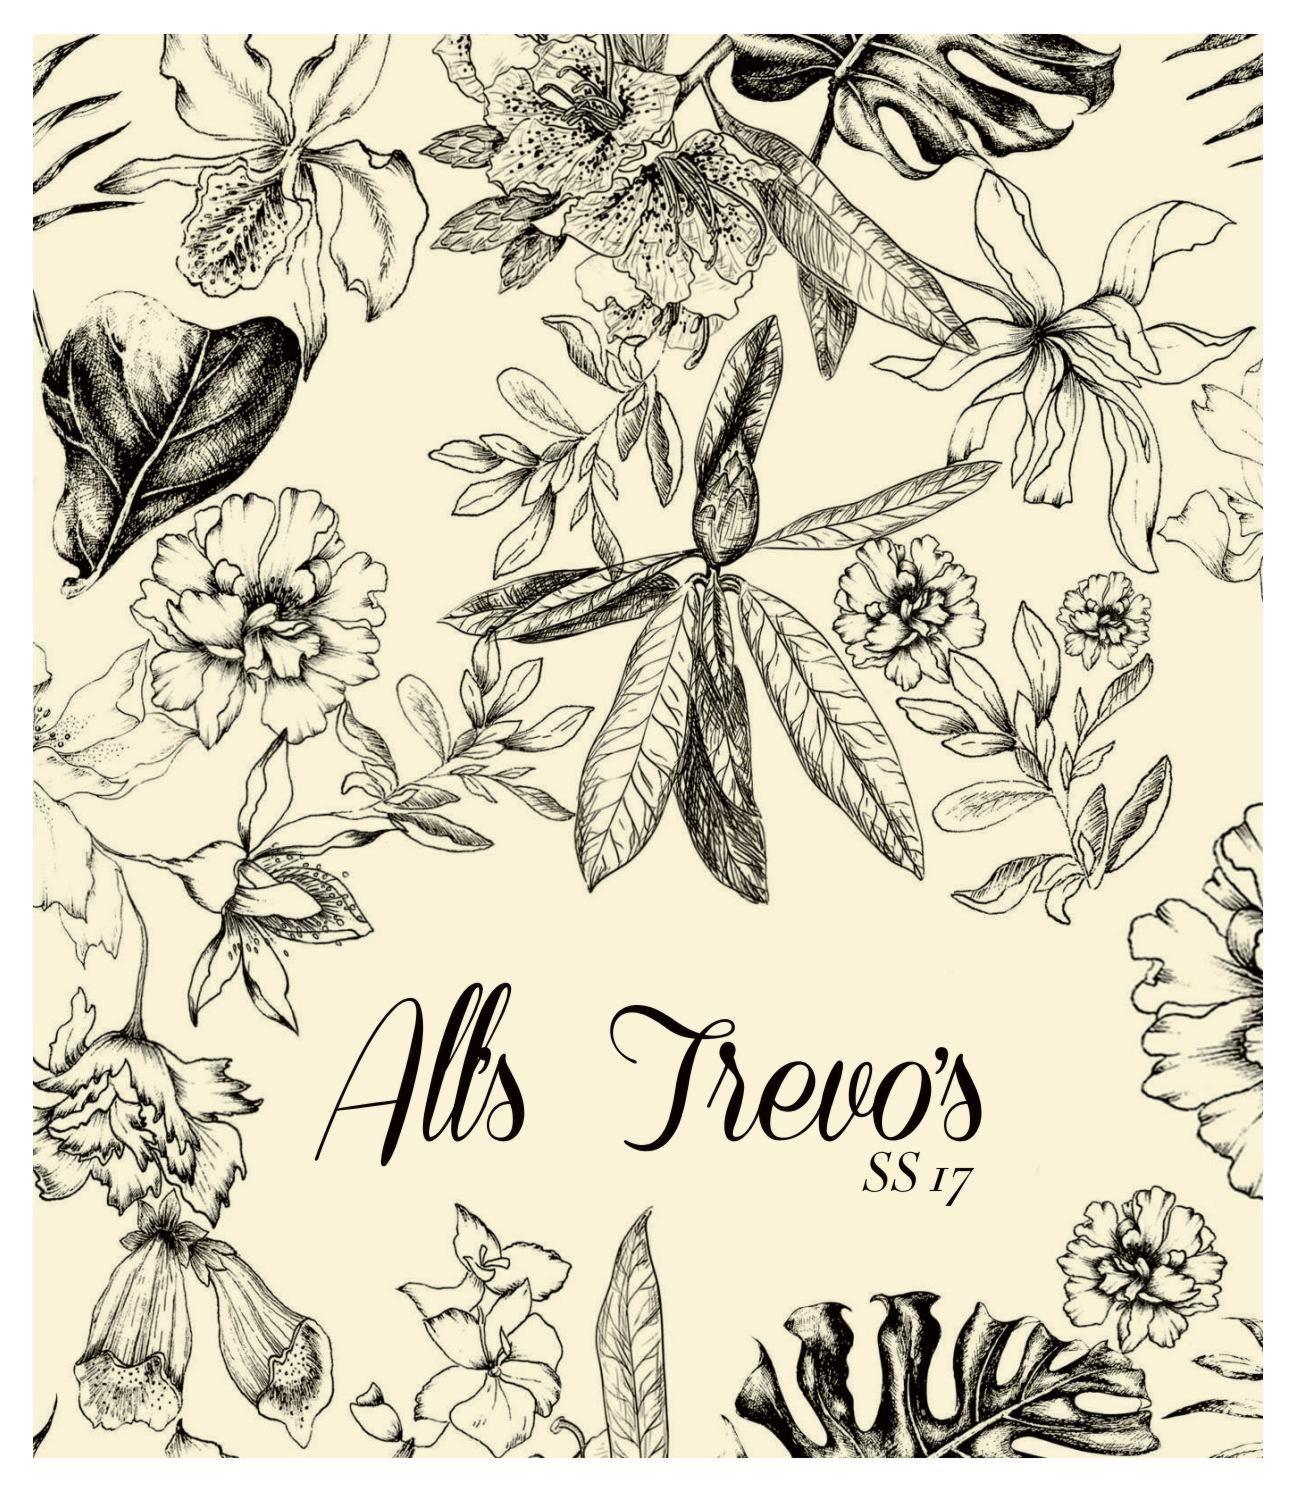 All's Trevo's Ss 2017 (2)